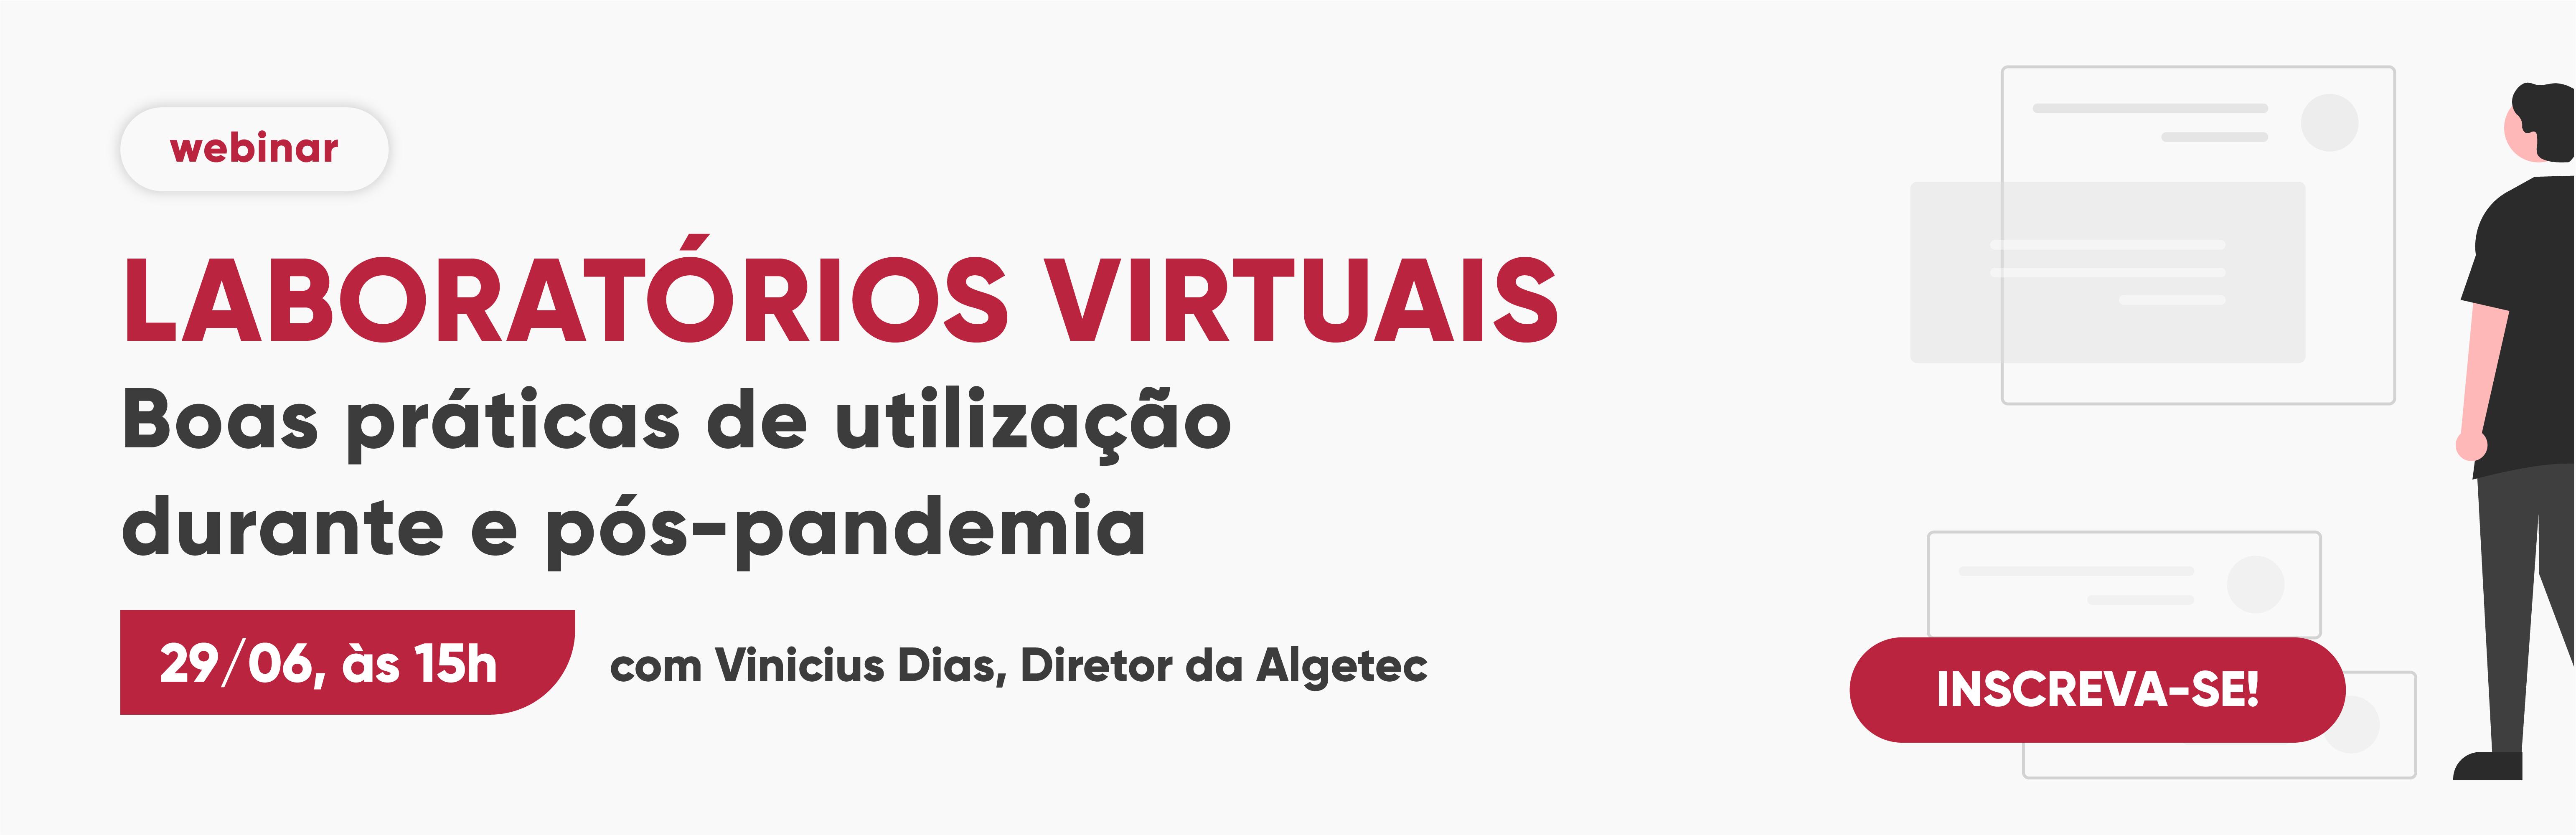 Webinar   Laboratórios virtuais